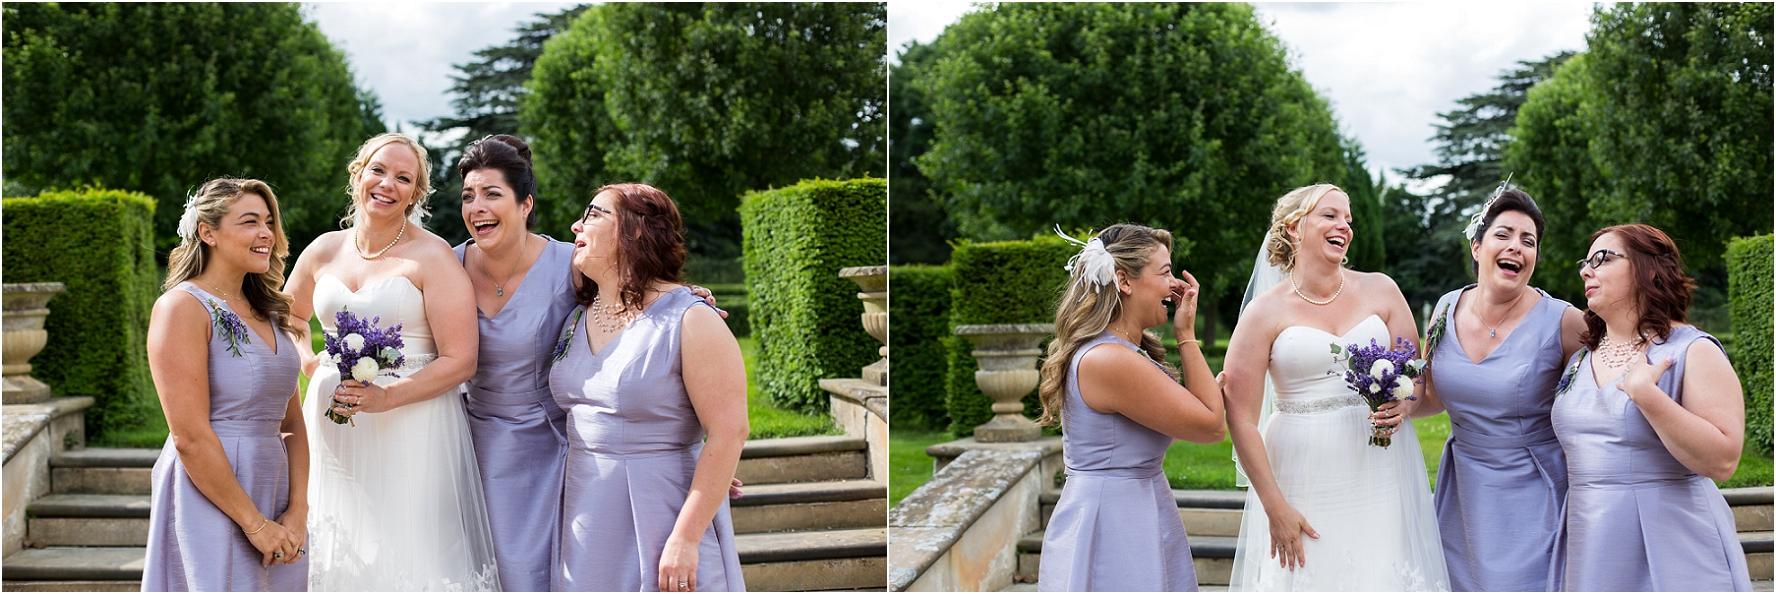 wedding-photography-the-orangery-settringham_0449